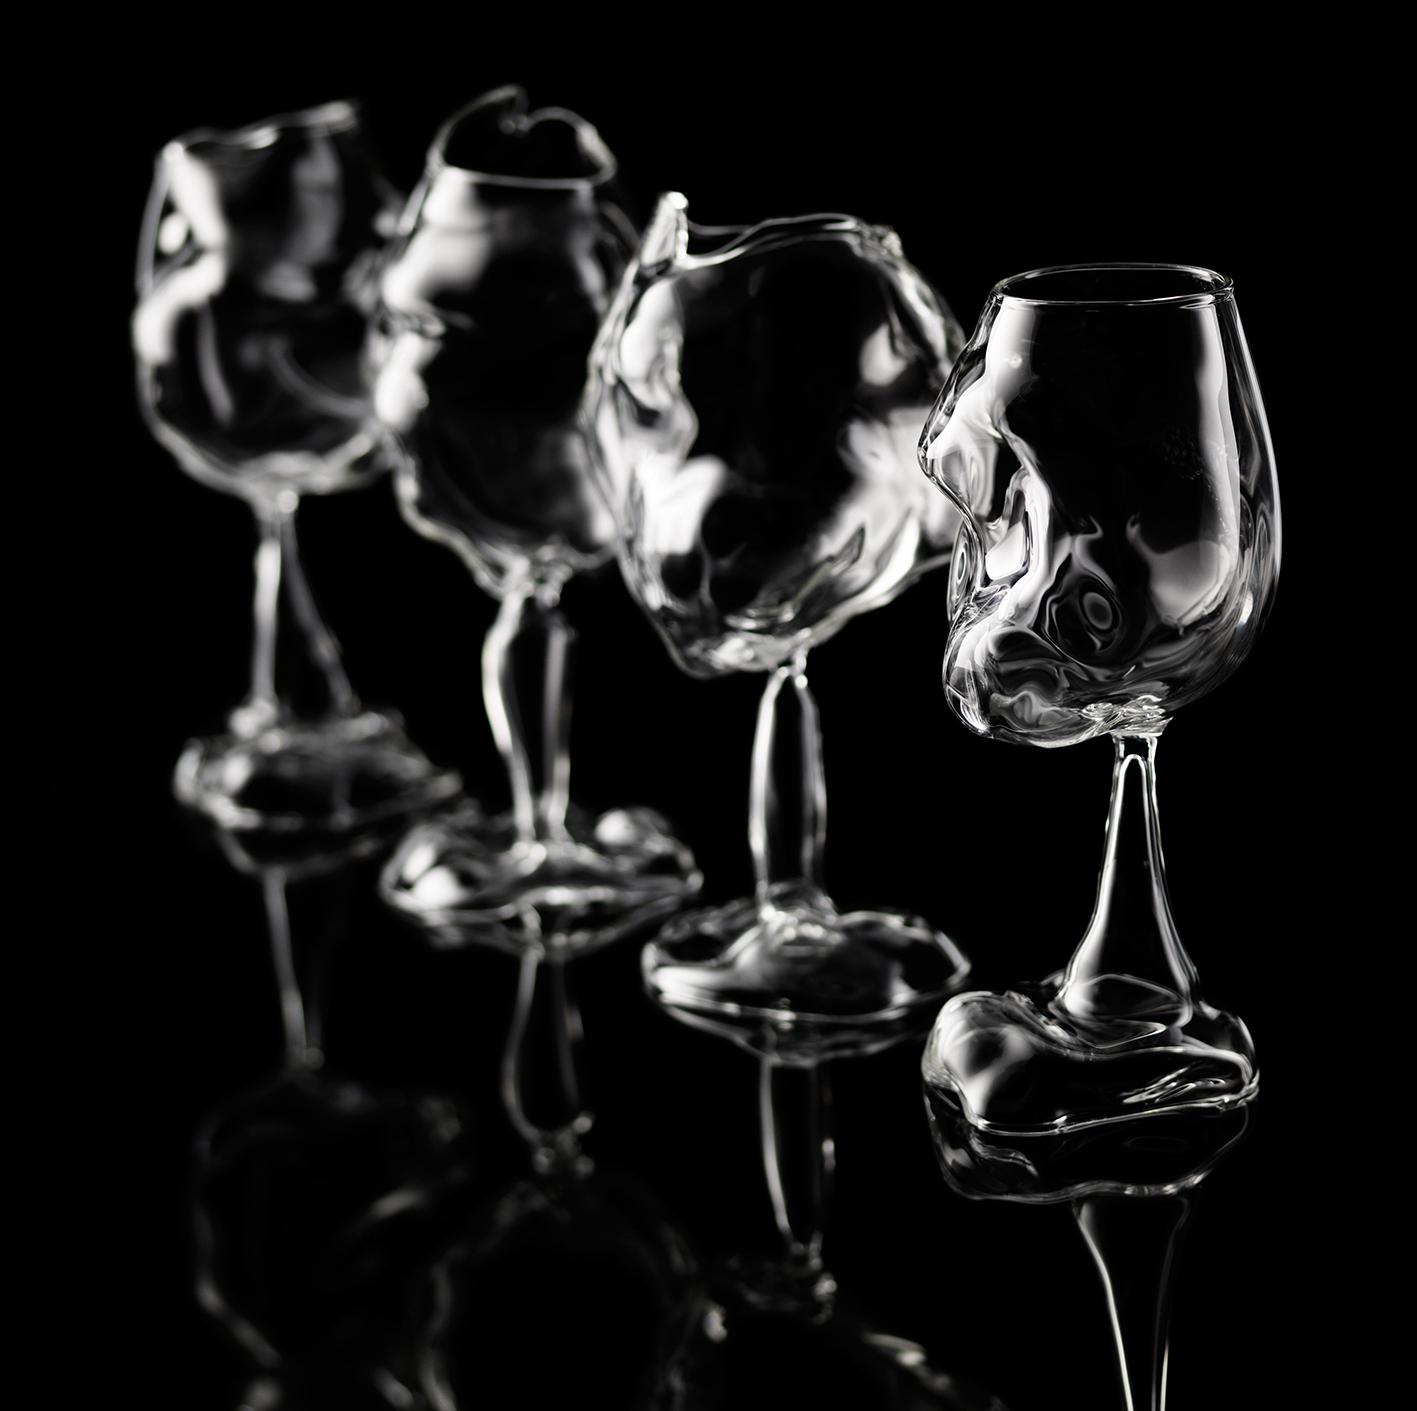 Crossfire Wineglass series  Borosilicate Glass, Lampwork  2010  Corning Museum of Glass Collection, Cincinnati Art Museum